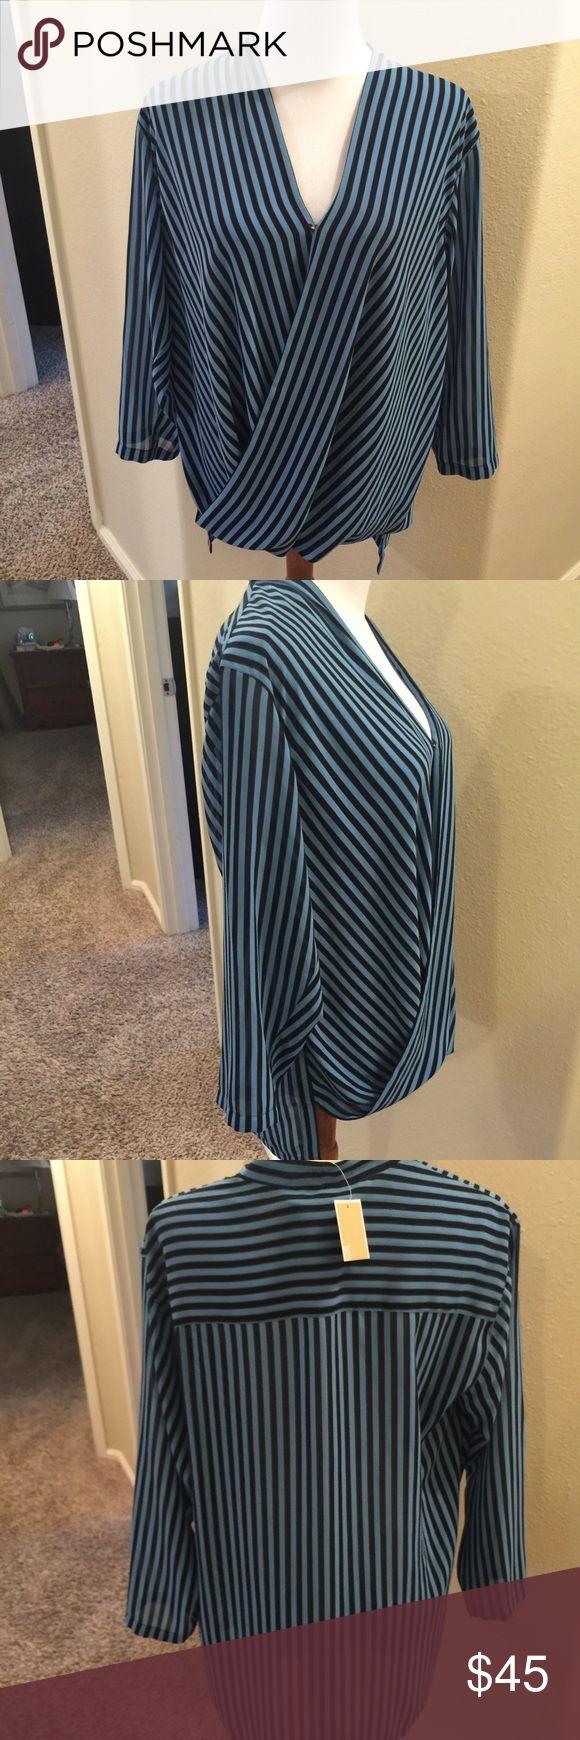 NWT MK striped blouse M Cute blue stripe blouse MK Size M 100% polyester Michael Kors Tops Blouses